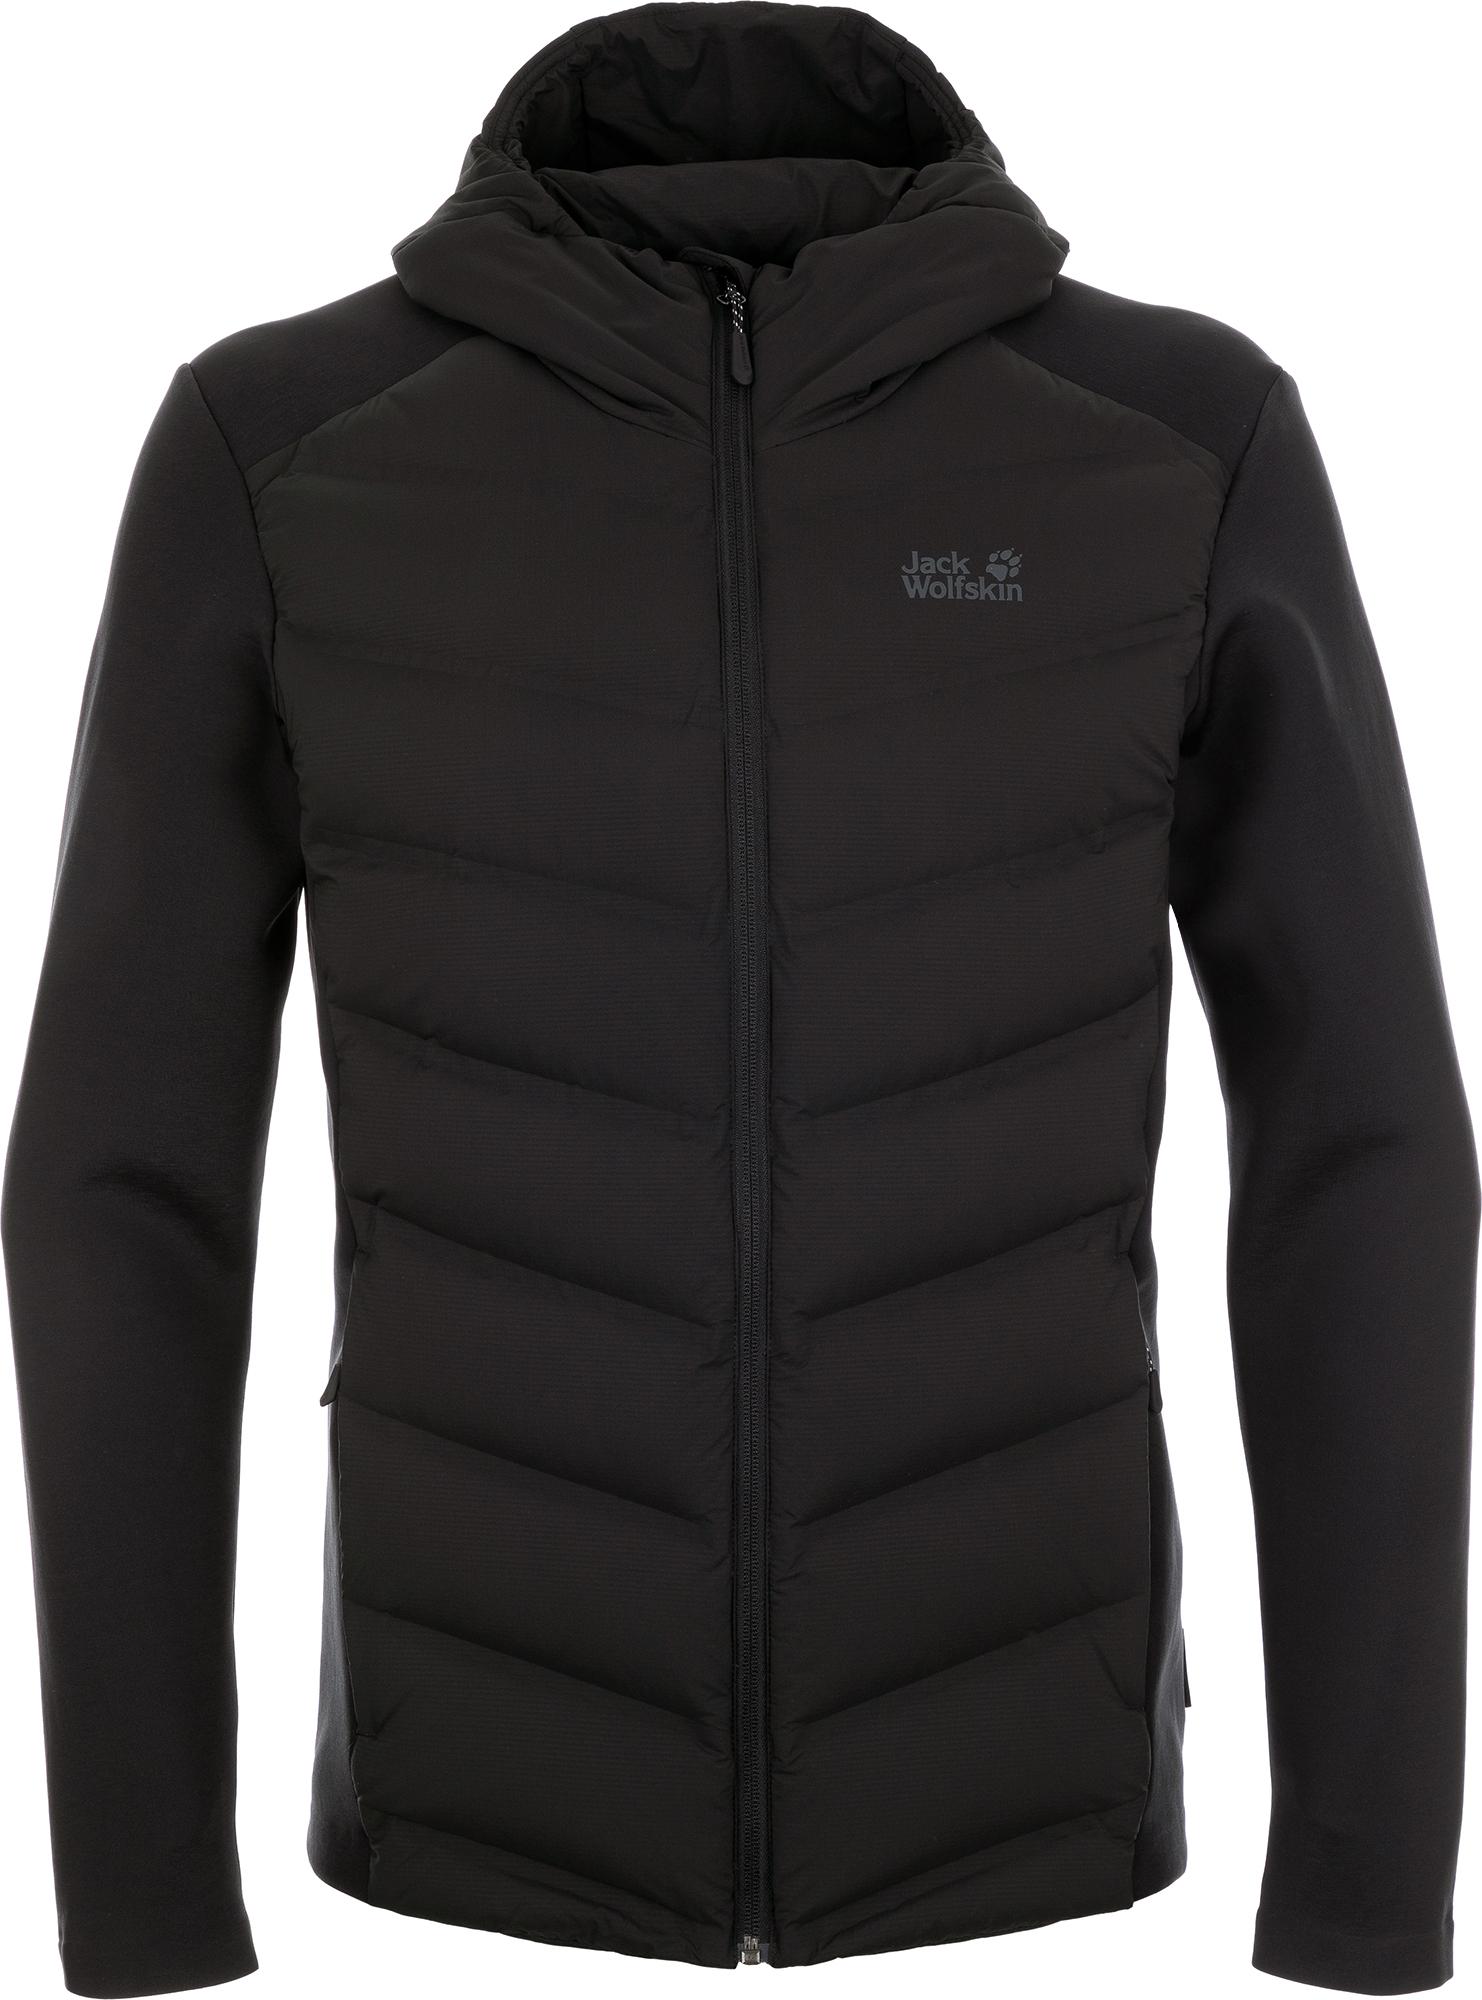 Jack Wolfskin Куртка пуховая мужская JACK WOLFSKIN Tasman, размер 46-48